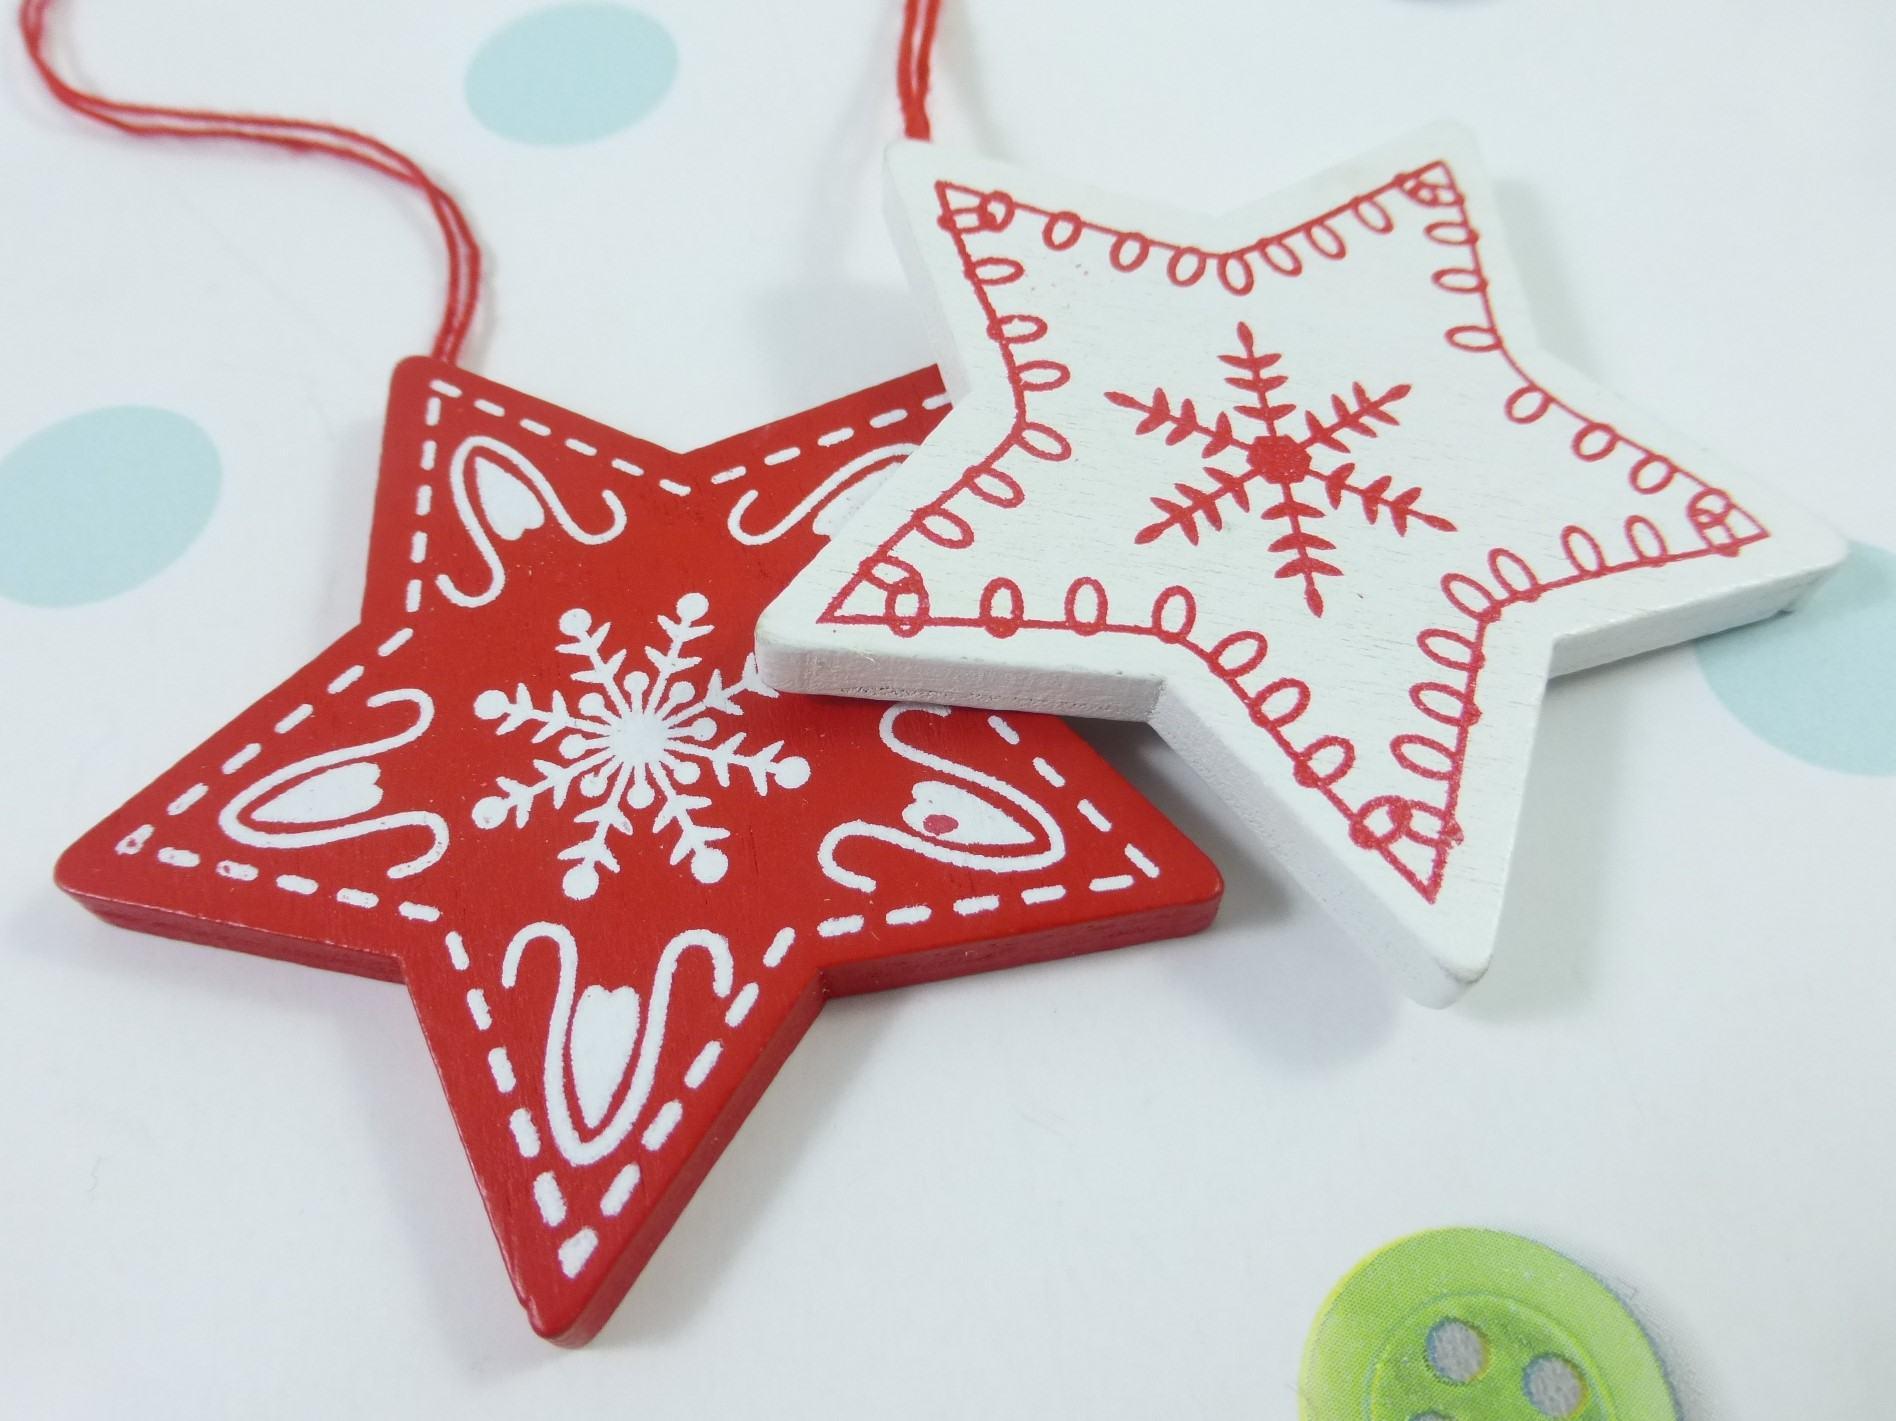 Christmas Stars, Letterbox Friendly, Pick Me Up Gift – The Smile Parcel Mini Kind Shop 4